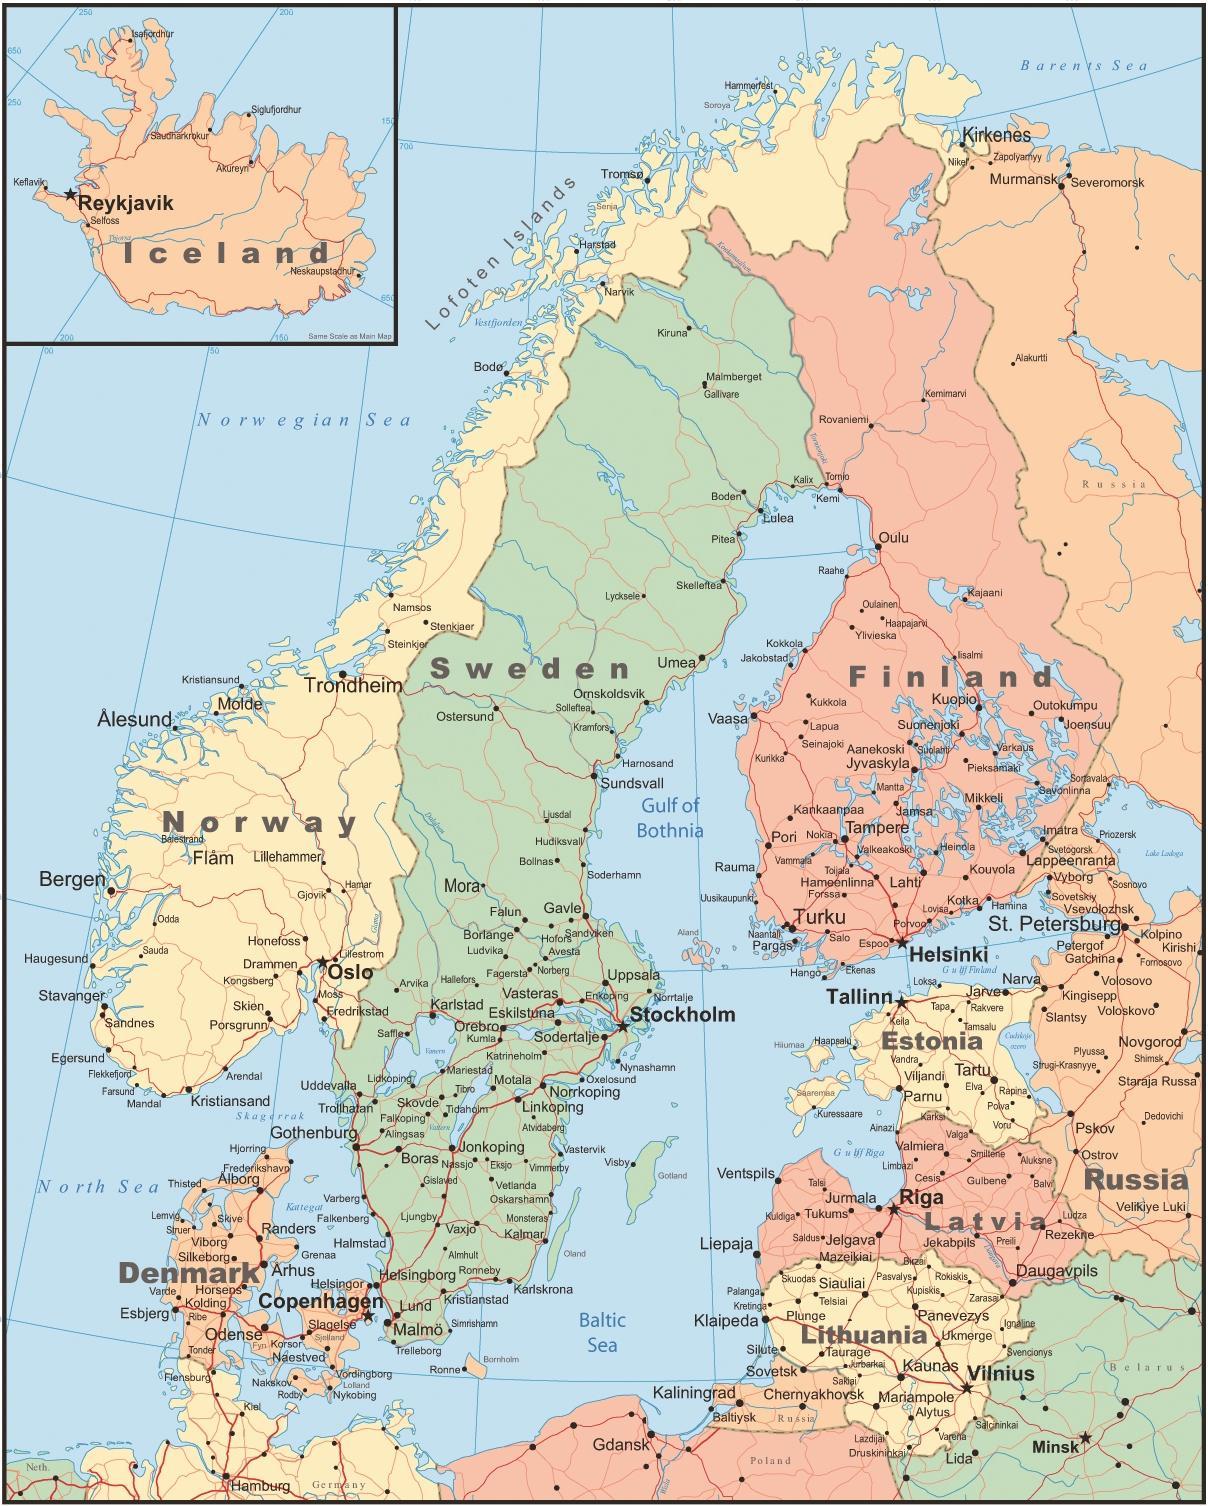 Karta Lander I Europa.Danmark Land Karta Karta Over Danmark Och Omgivande Lander Norra